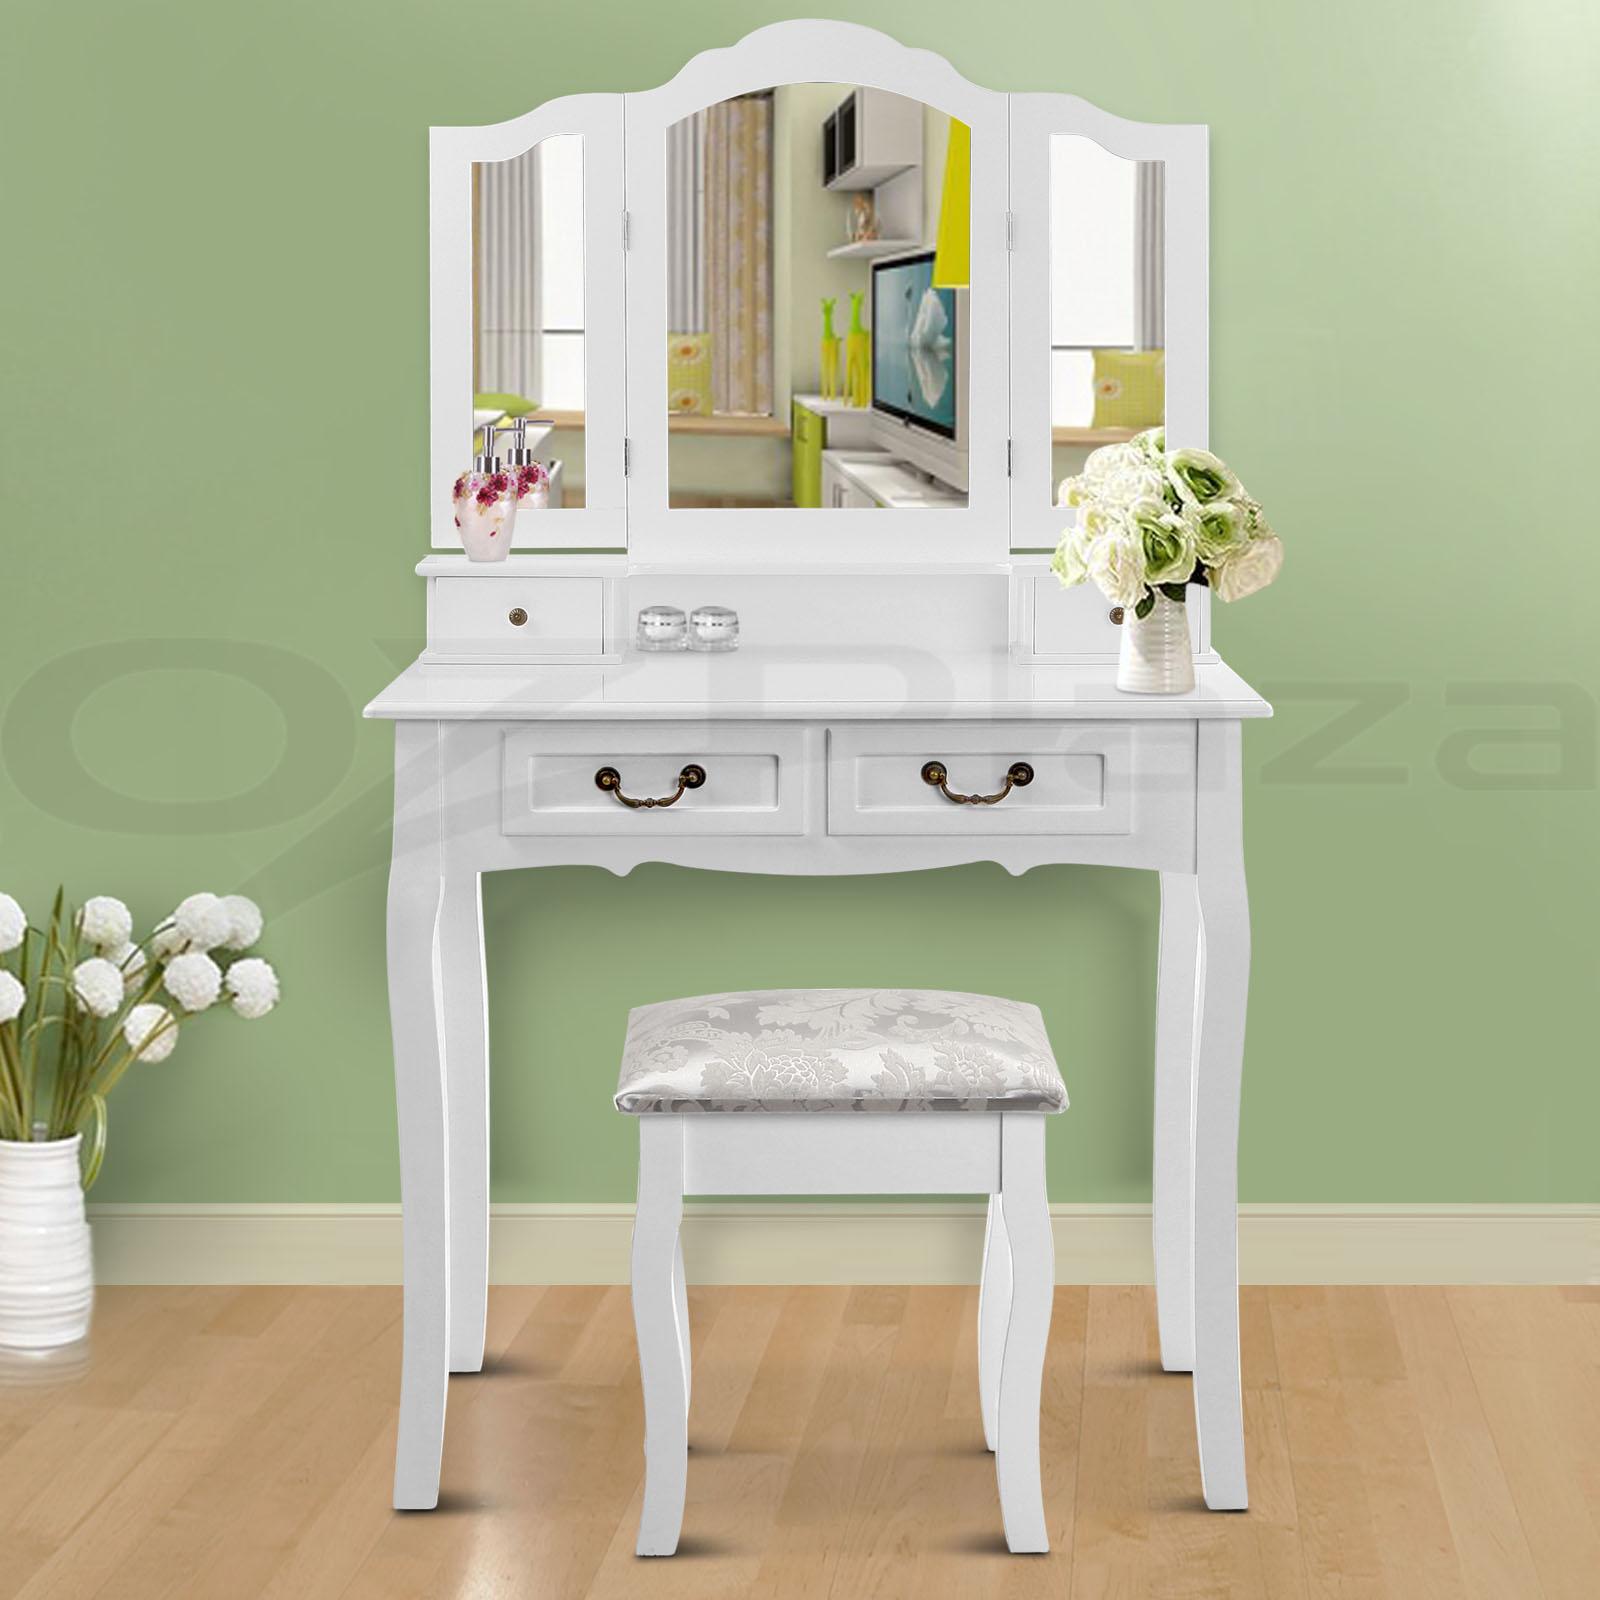 Luxury Dressing Table & Stool Mirrors Jewellery Cabinet